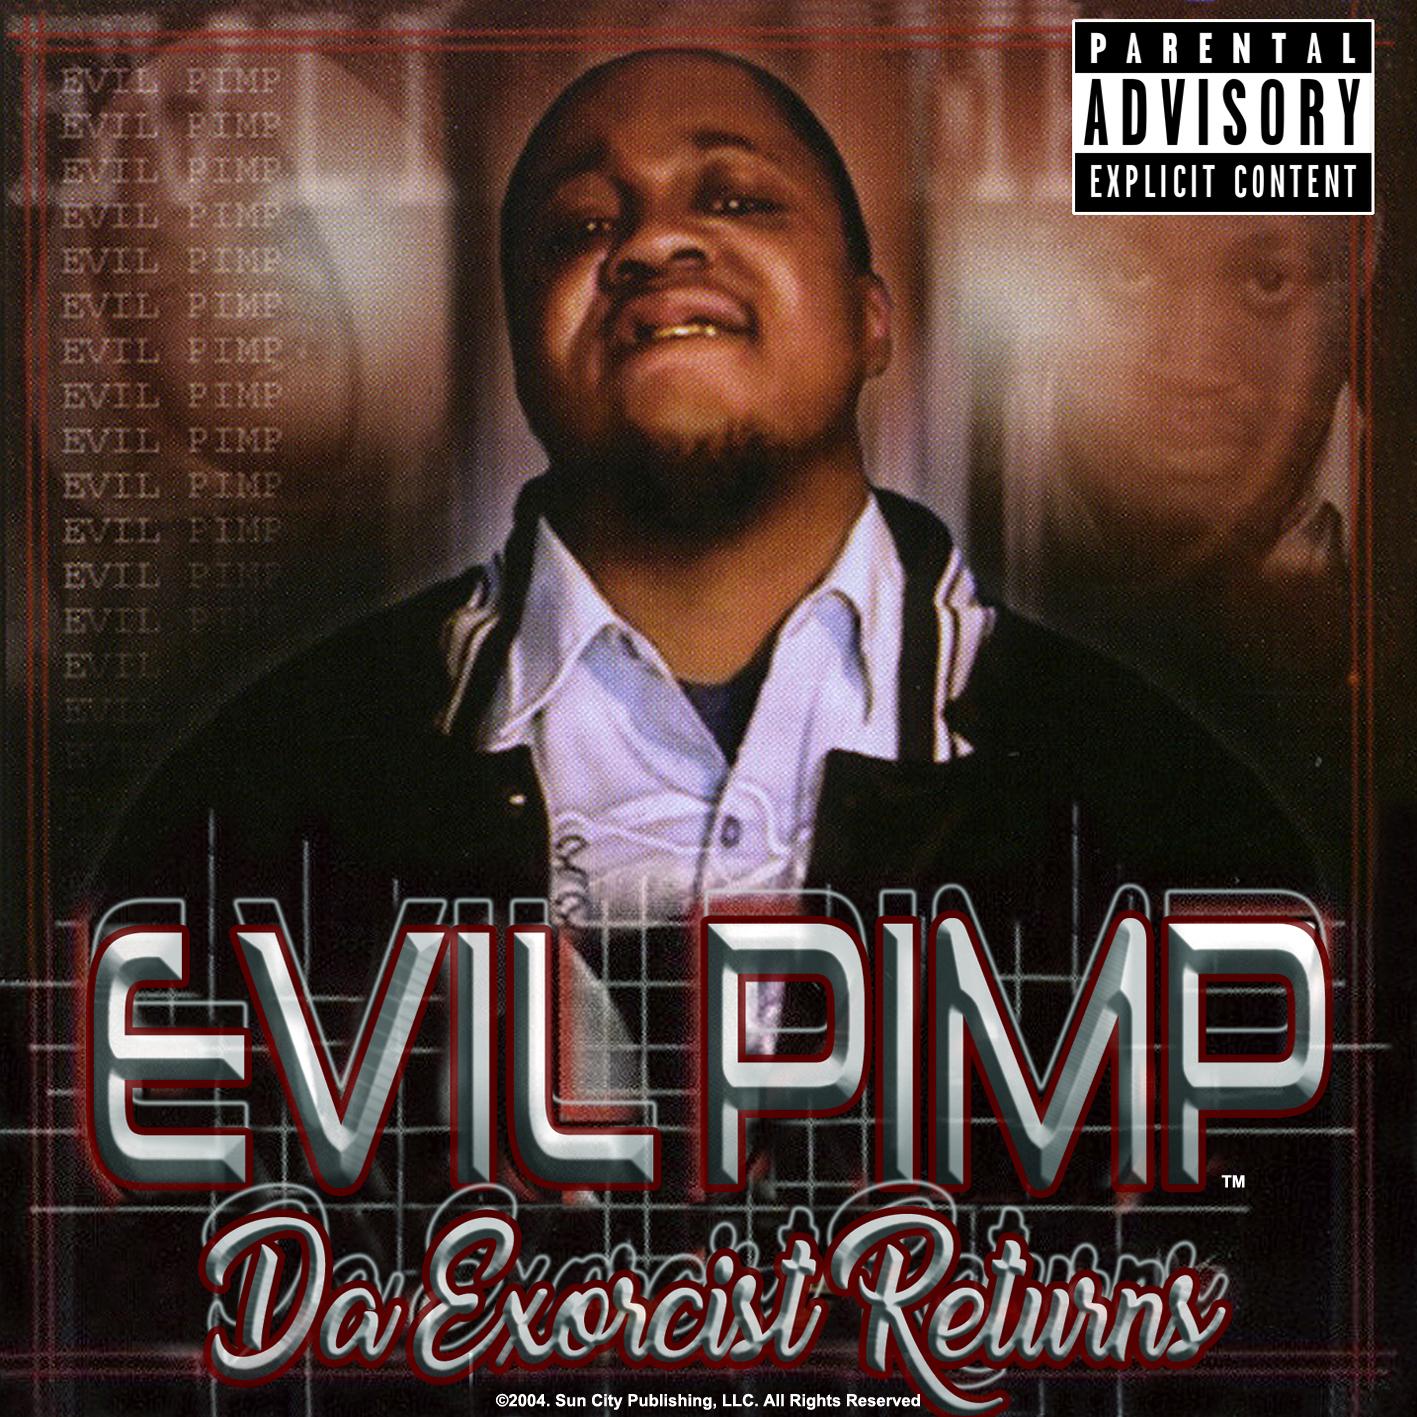 Evil Pimp